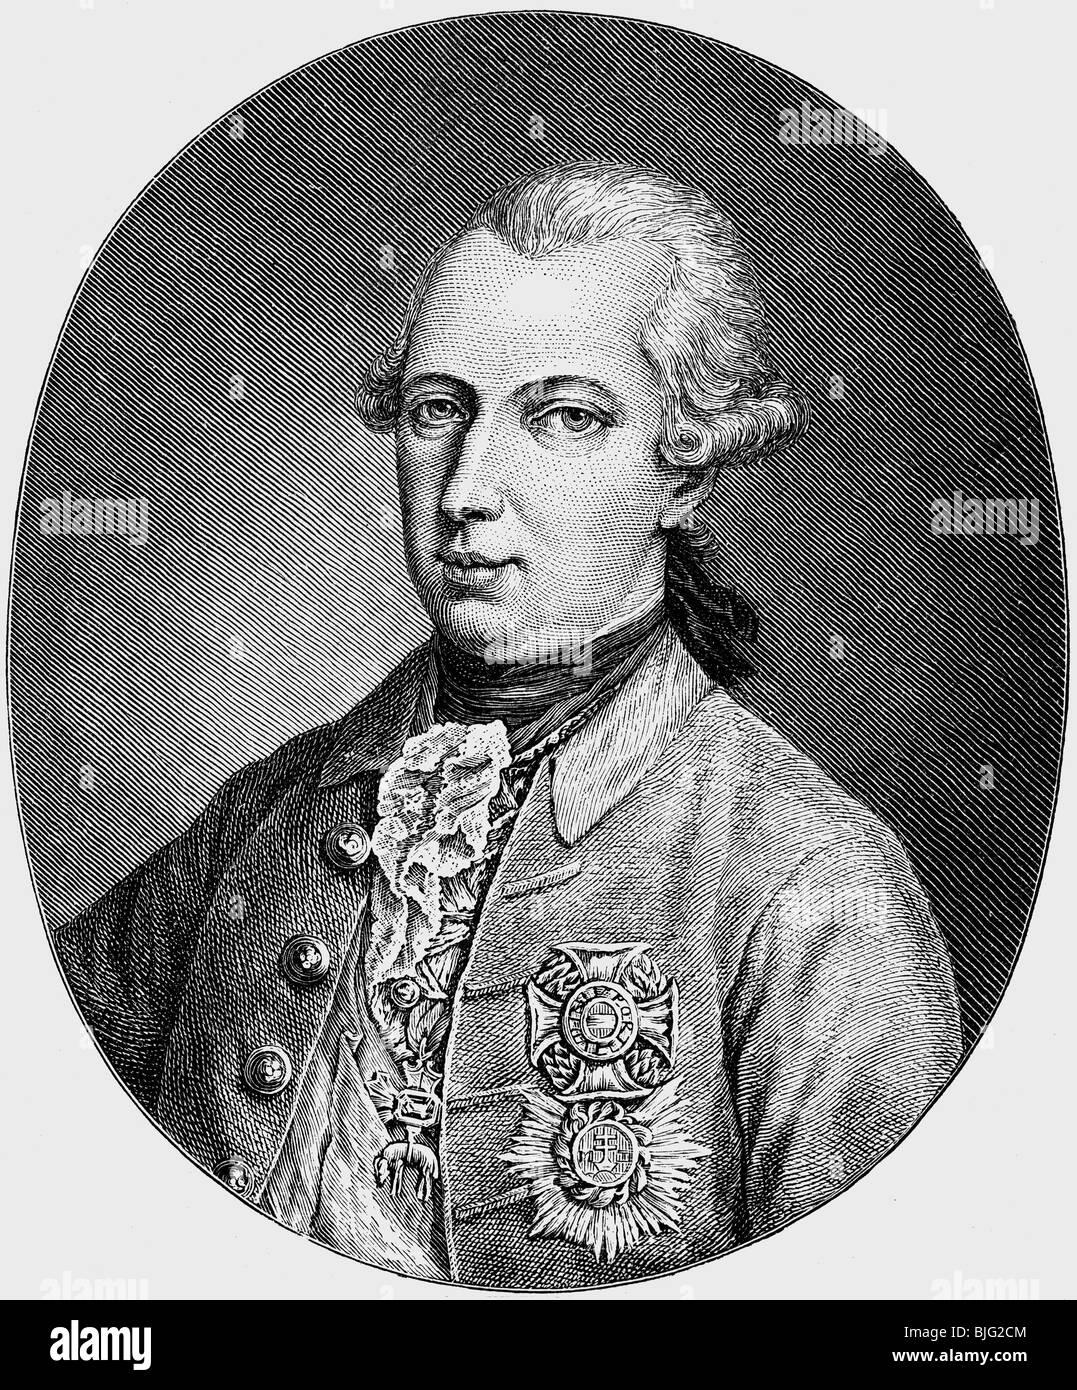 Joseph II, 13.3.1741 - 20.2.1790, Holy Roman Emperor 18.8.1765 - 20.2.1790, portrait, wood engraving, 19th century, Stock Photo